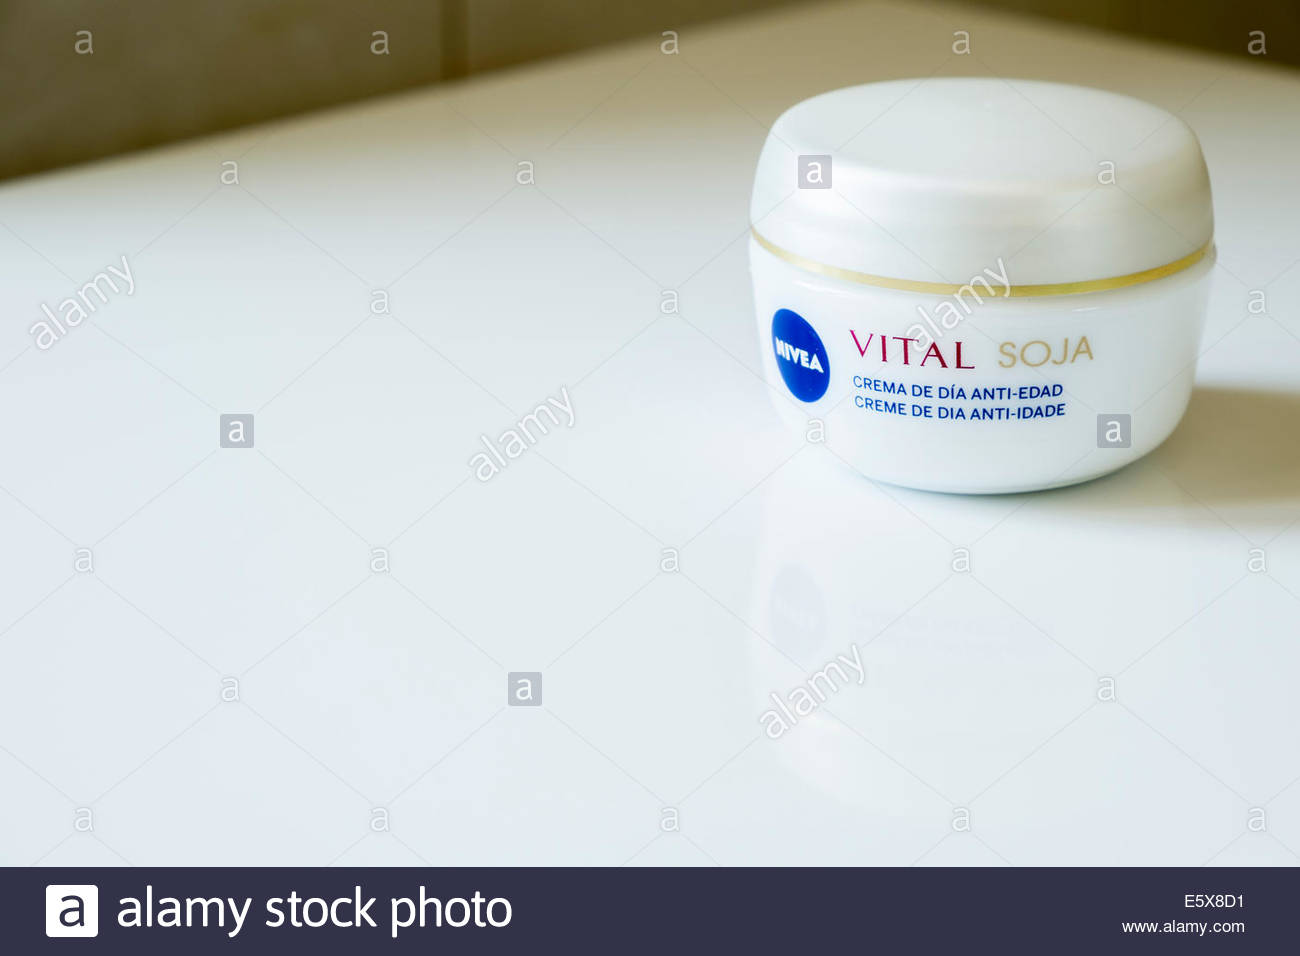 Nivea Vital soja moisturing day cream as sold in Portugal - Stock Image